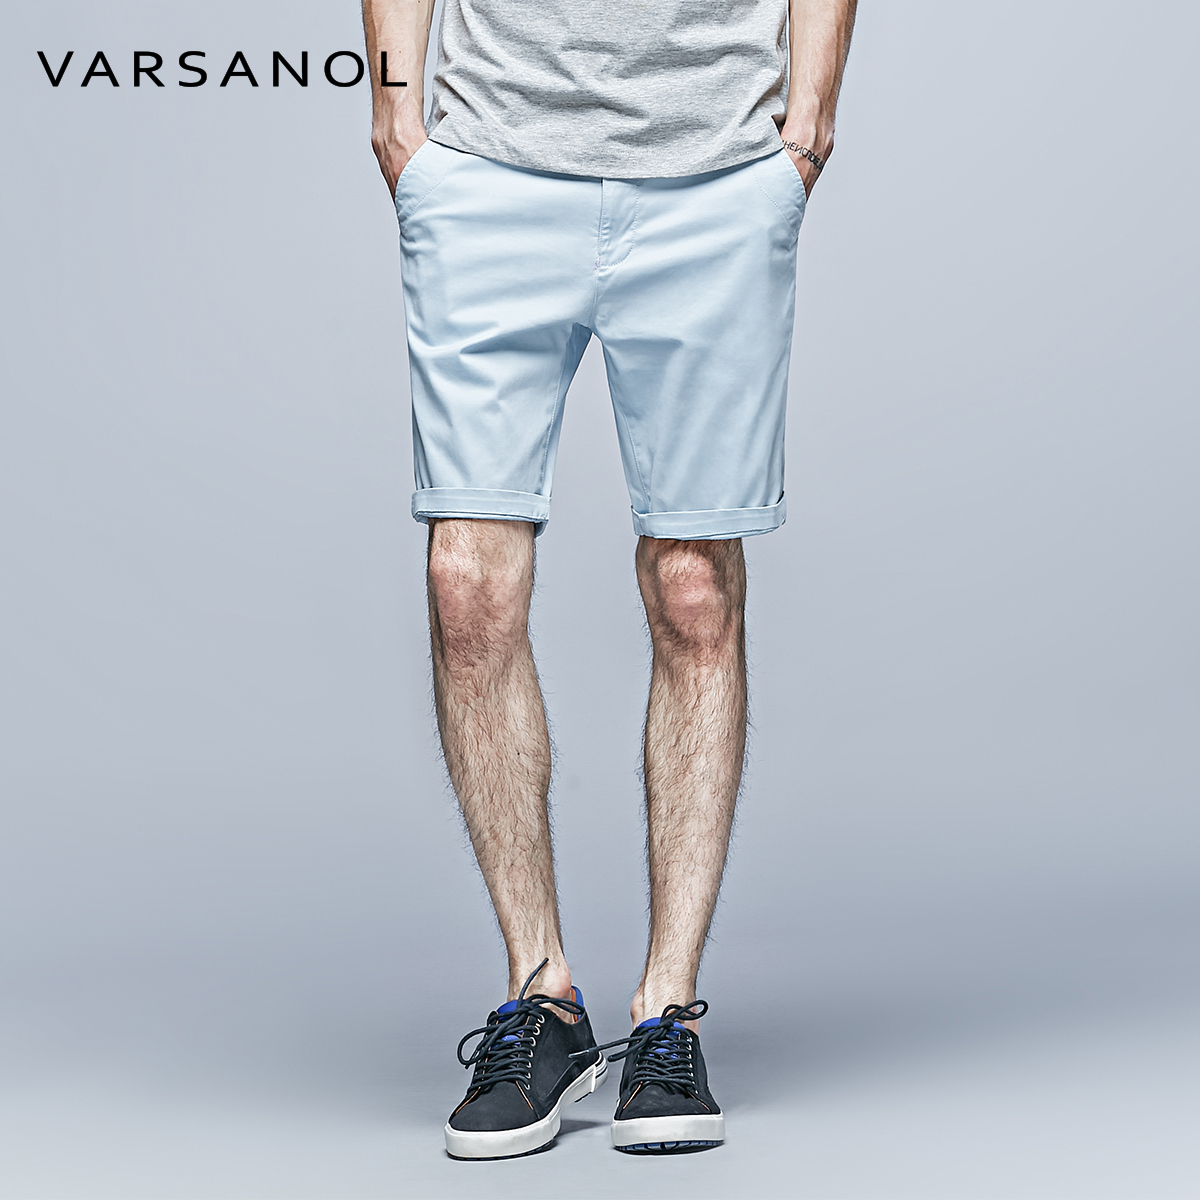 VARSANOL Official Store VARSANOL New Cotton Casual Men Short pants Summer Mid Waist Board Trouser Solid Fashion Zipper Straight Large Size Pocket10color